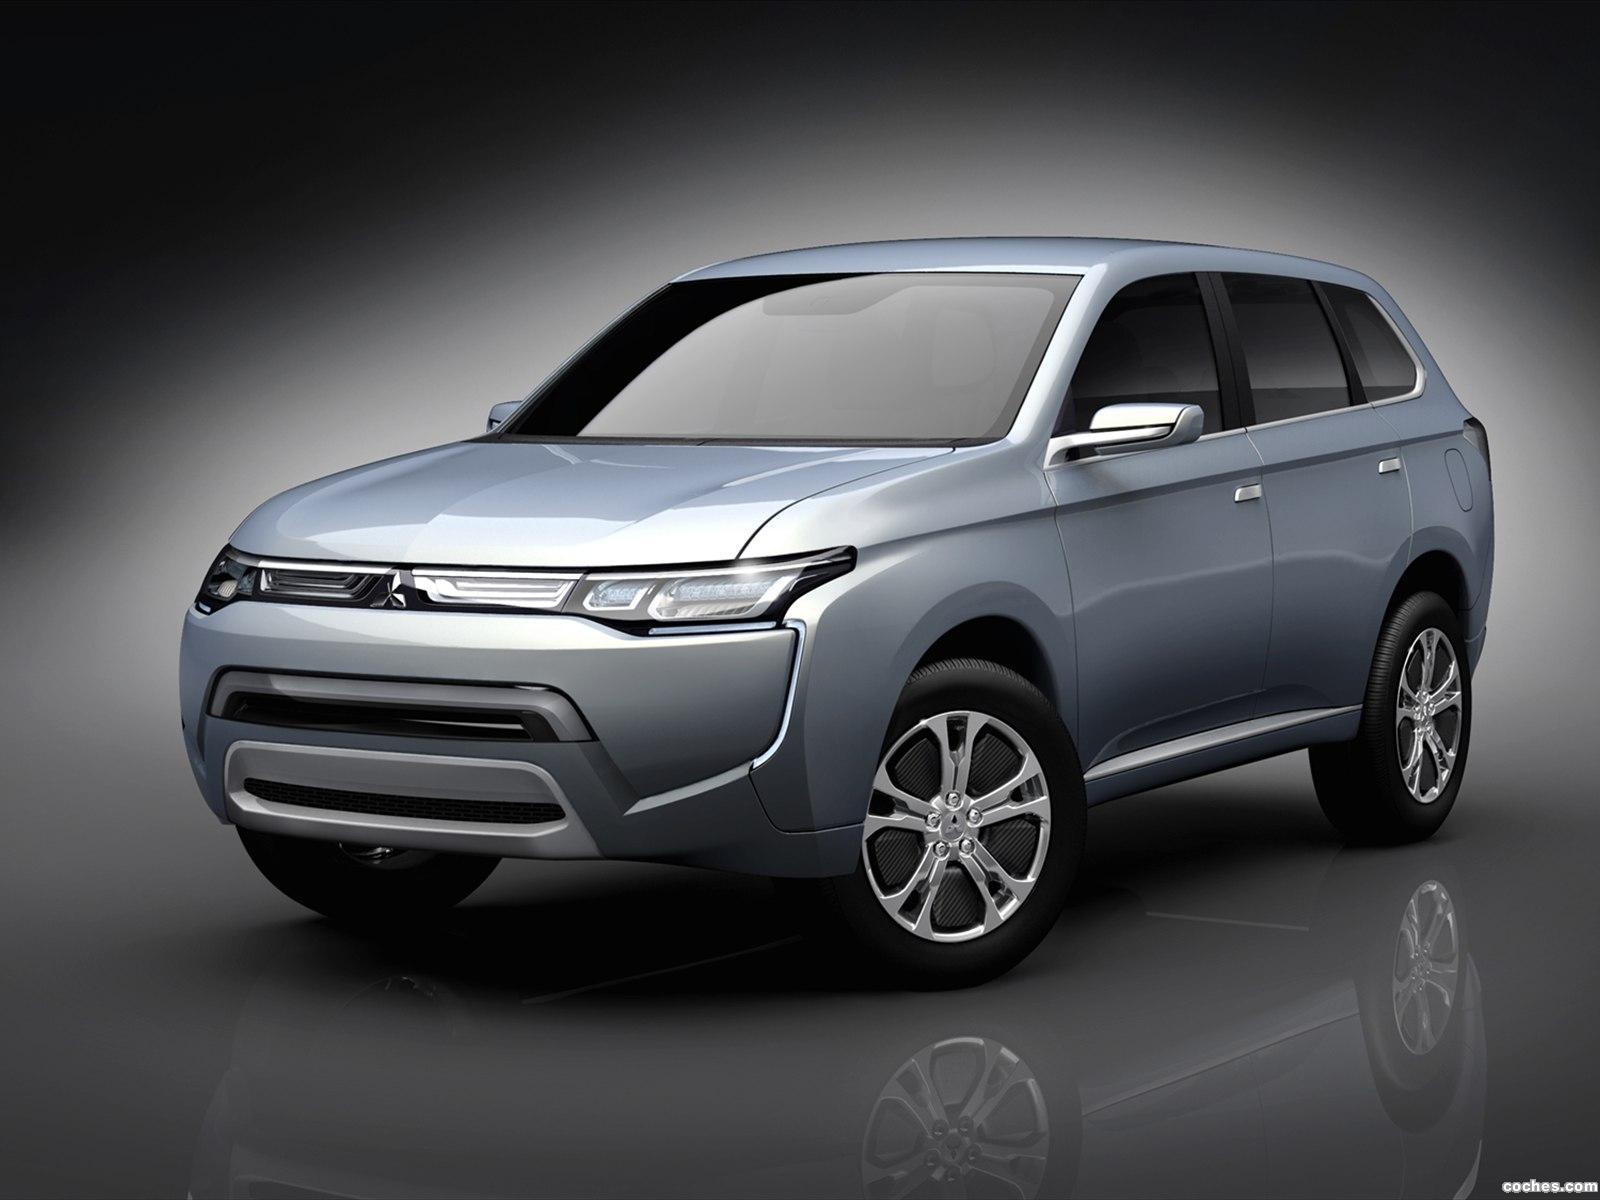 Foto 0 de Mitsubishi Concept PX MiEV II 2011